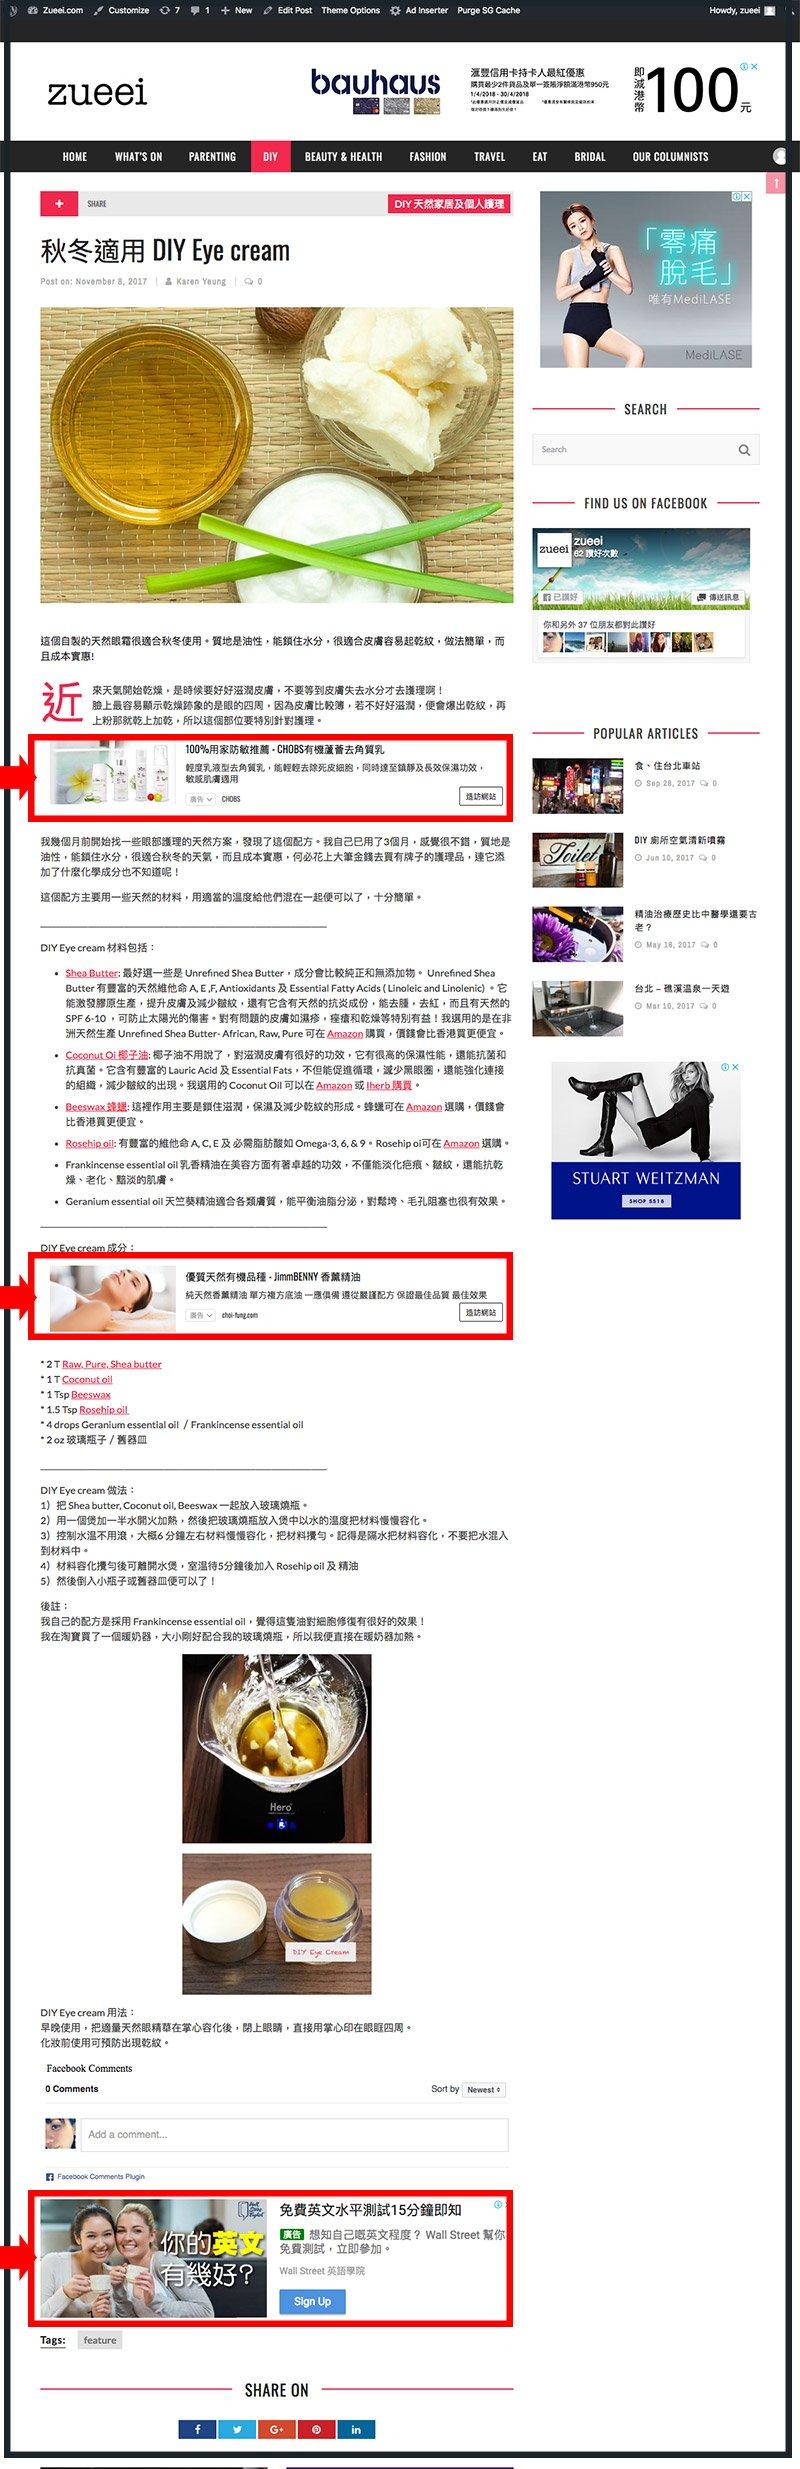 Zueei.com 作者奬勵計劃